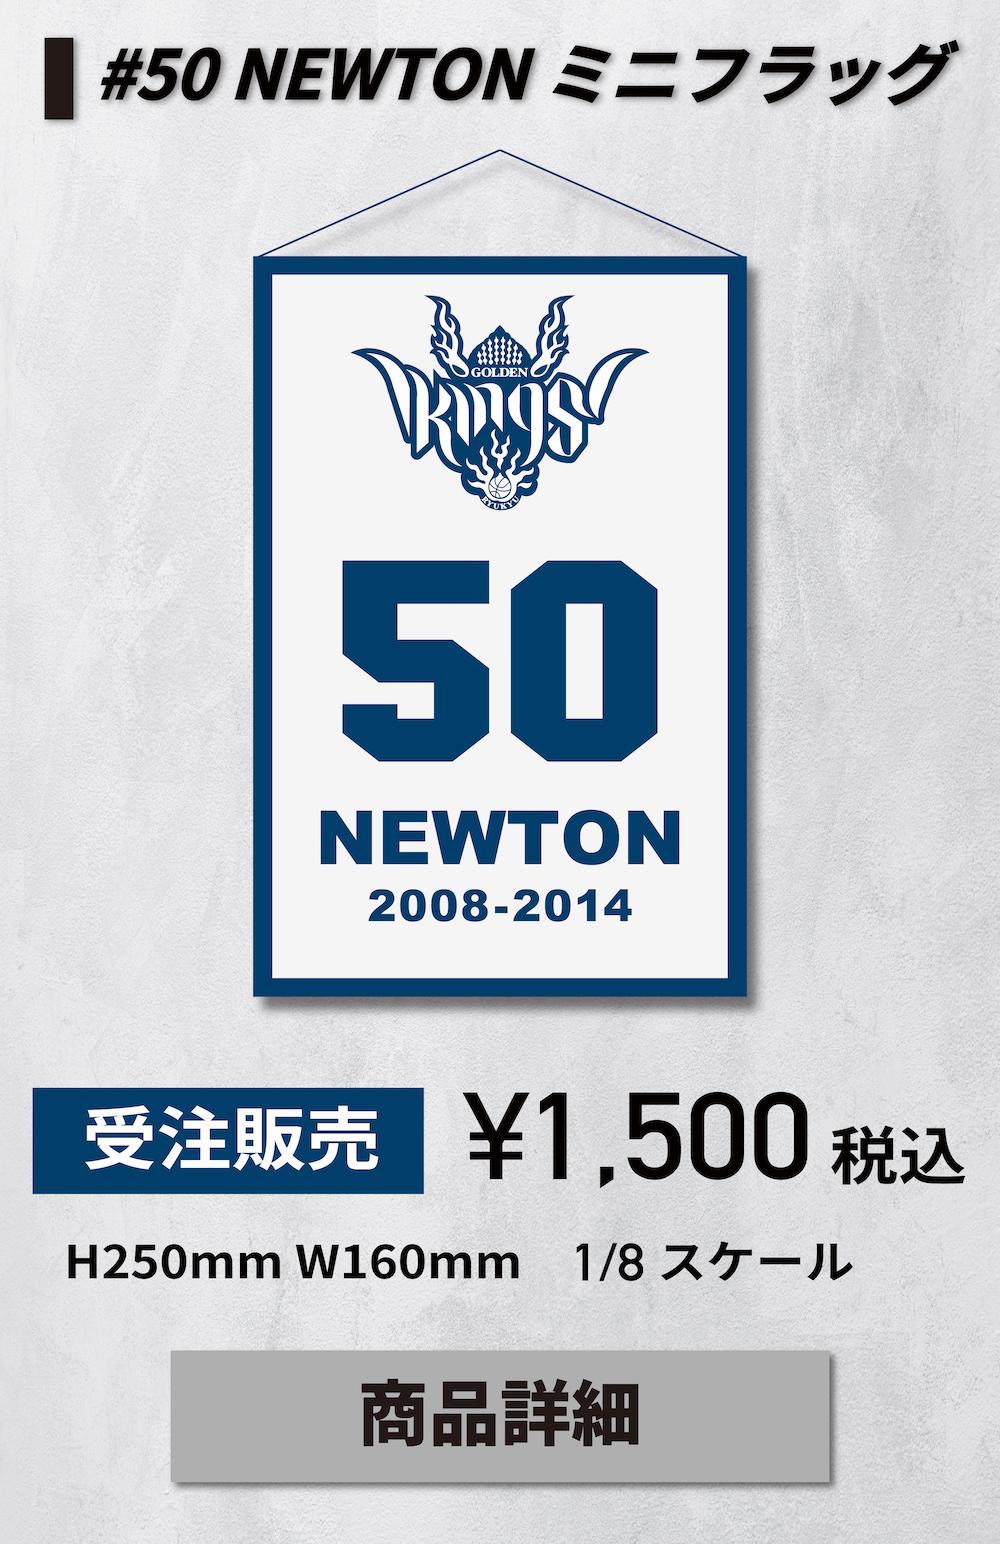 #50 NEWTON ミニフラッグ